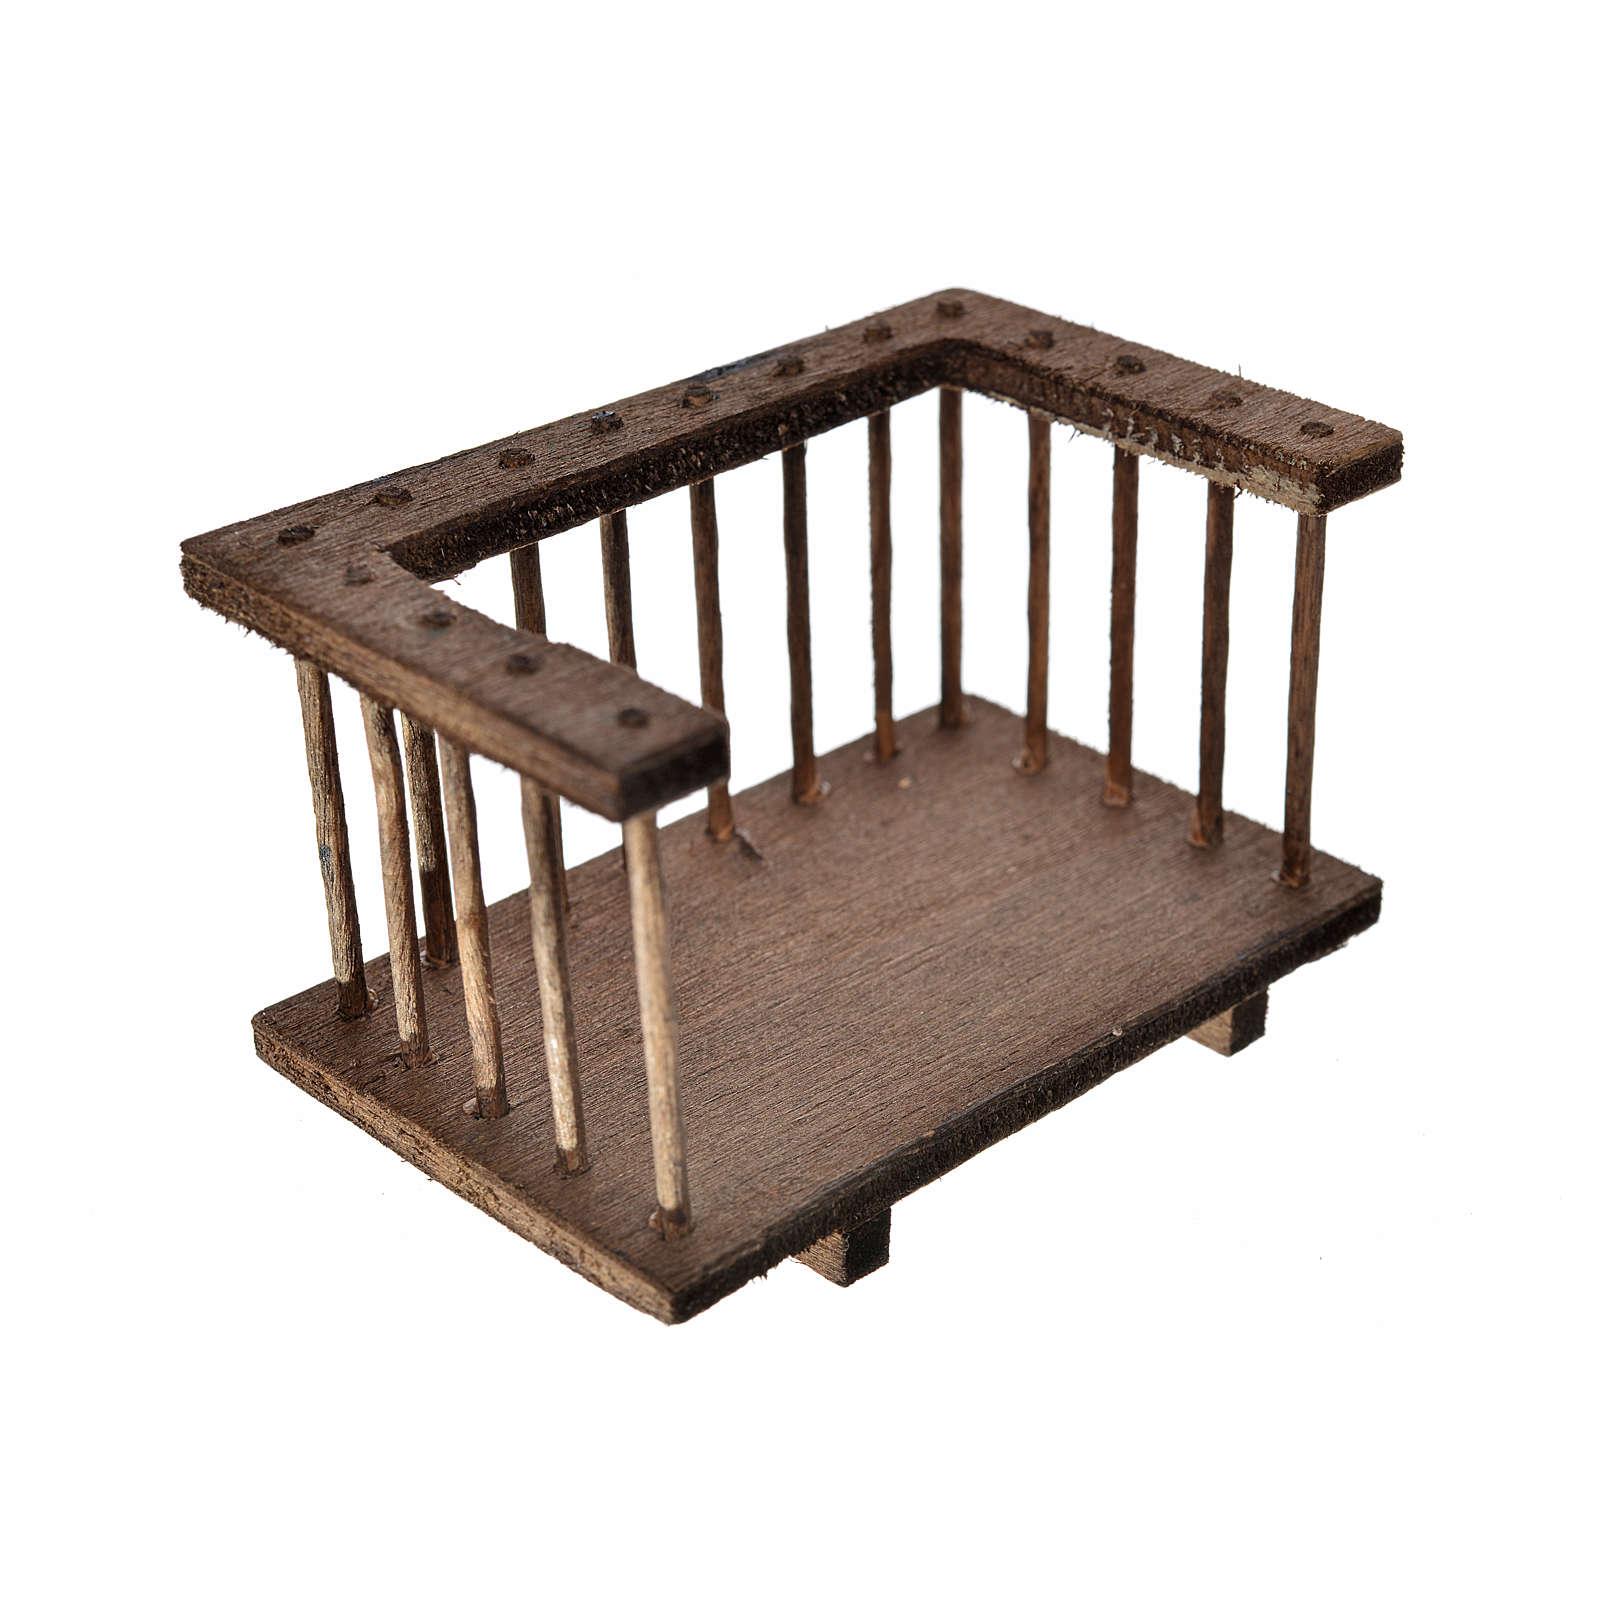 Balcone legno presepe7x3,5x4 cm 4